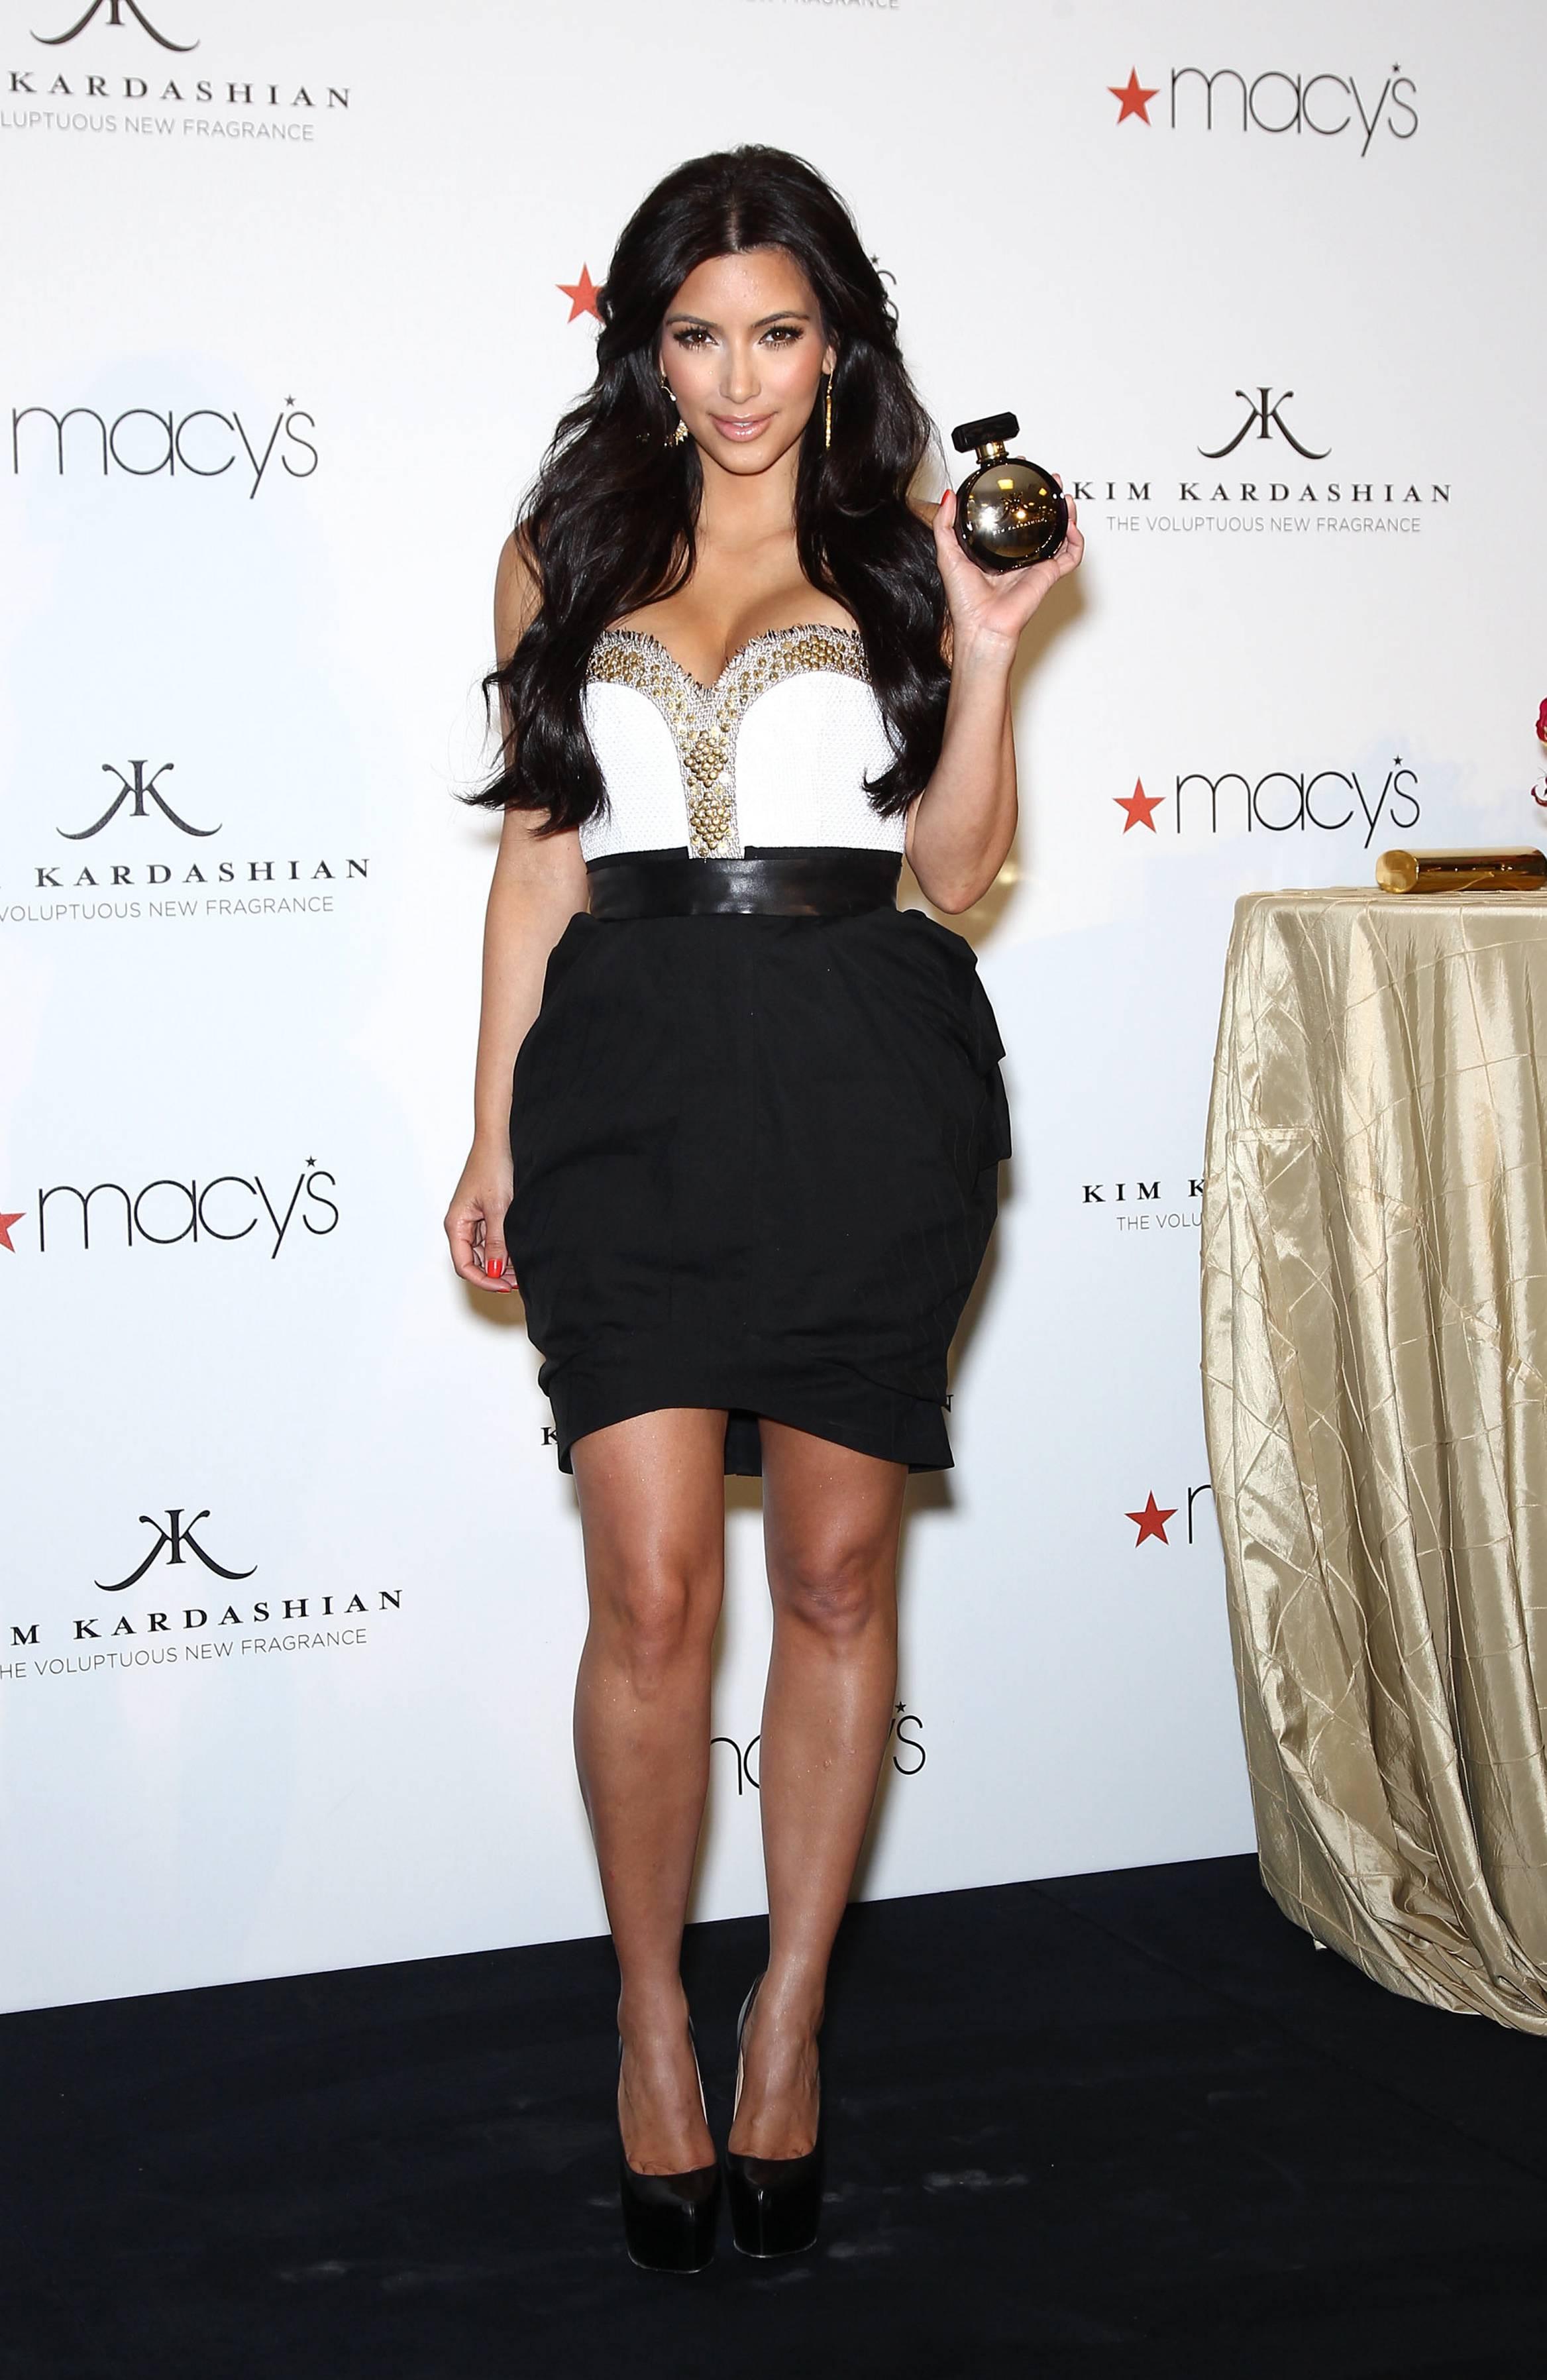 86329_celebrity_paradise.com_Kim_Kardashian_Fragance_13_122_7lo.jpg